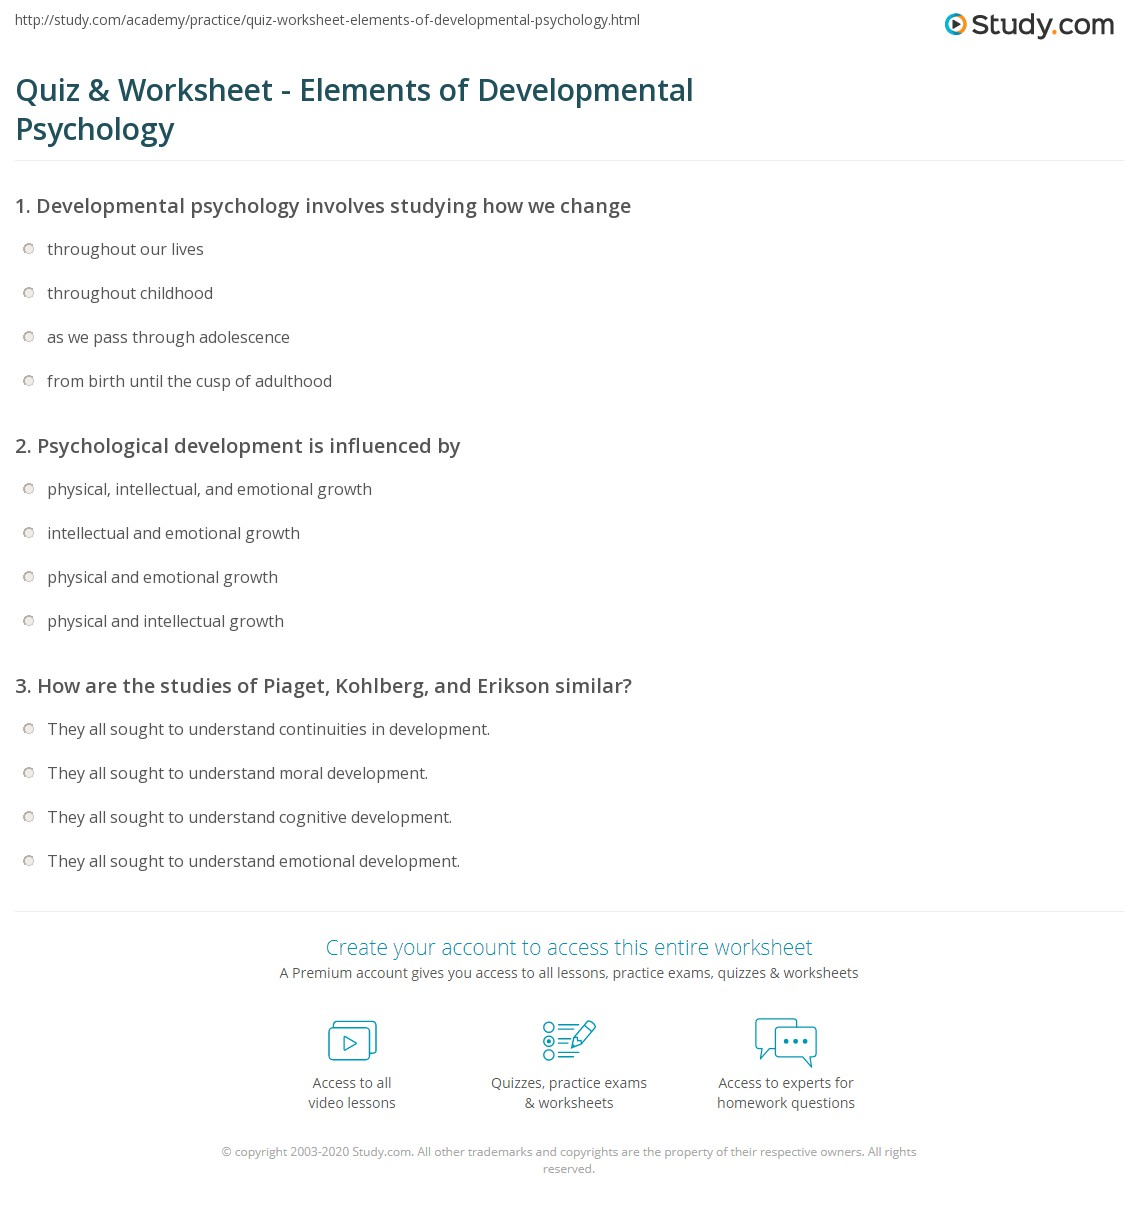 Workbooks psychology worksheets : Quiz & Worksheet - Elements of Developmental Psychology | Study.com